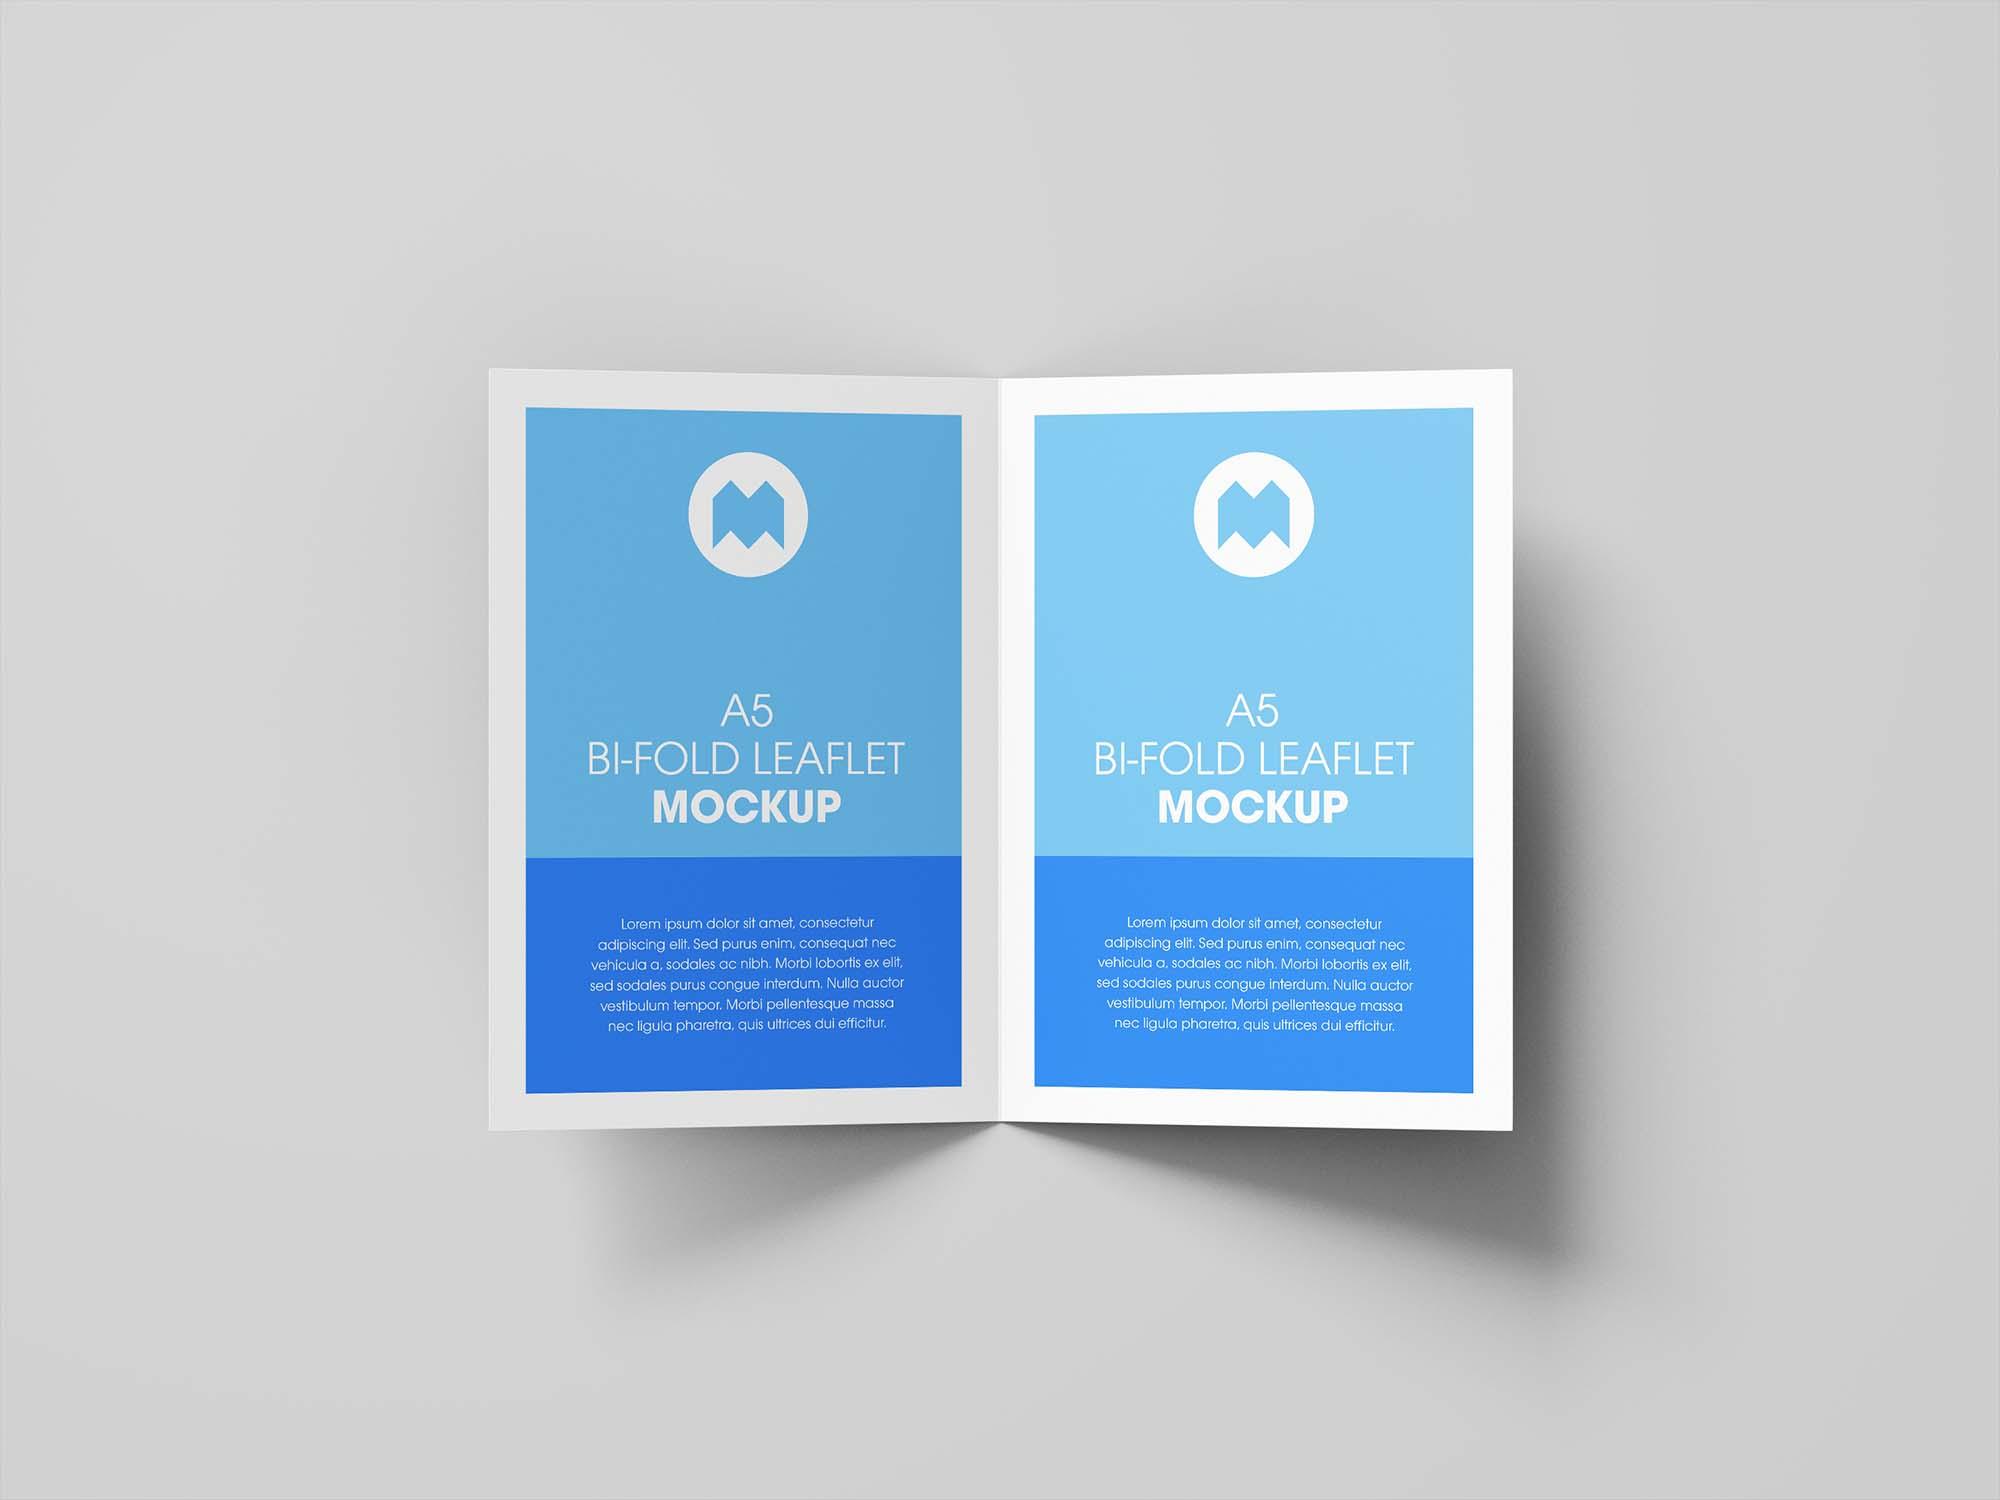 A5 Bifold Leaflet Brochure Mockup PSD